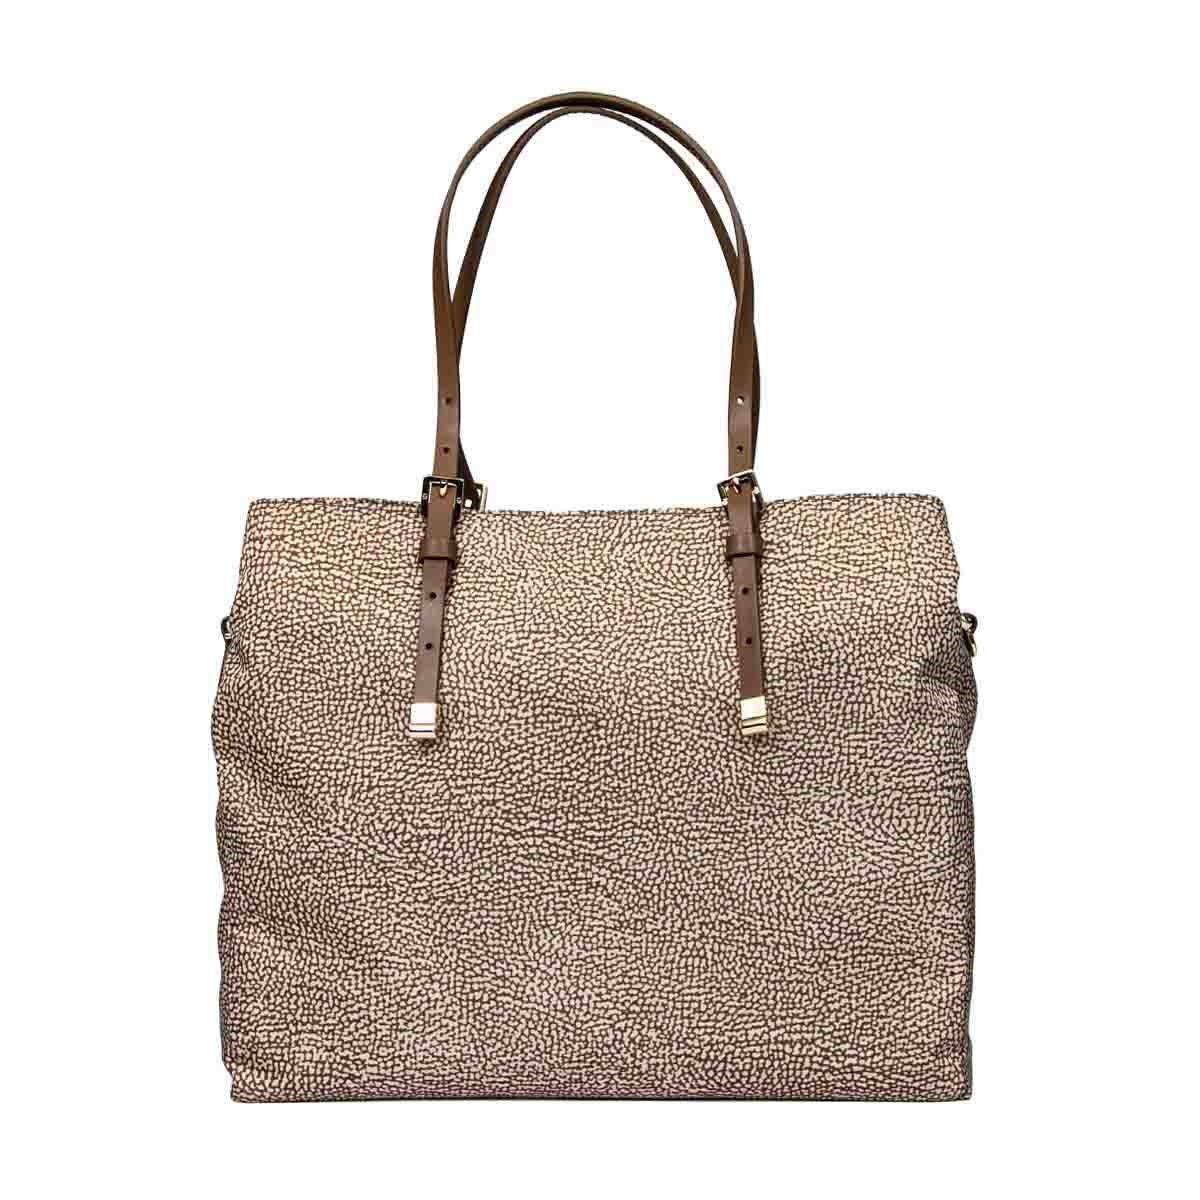 Borbonese Handbags BORBONESE WOMEN'S BEIGE POLYESTER HANDBAG